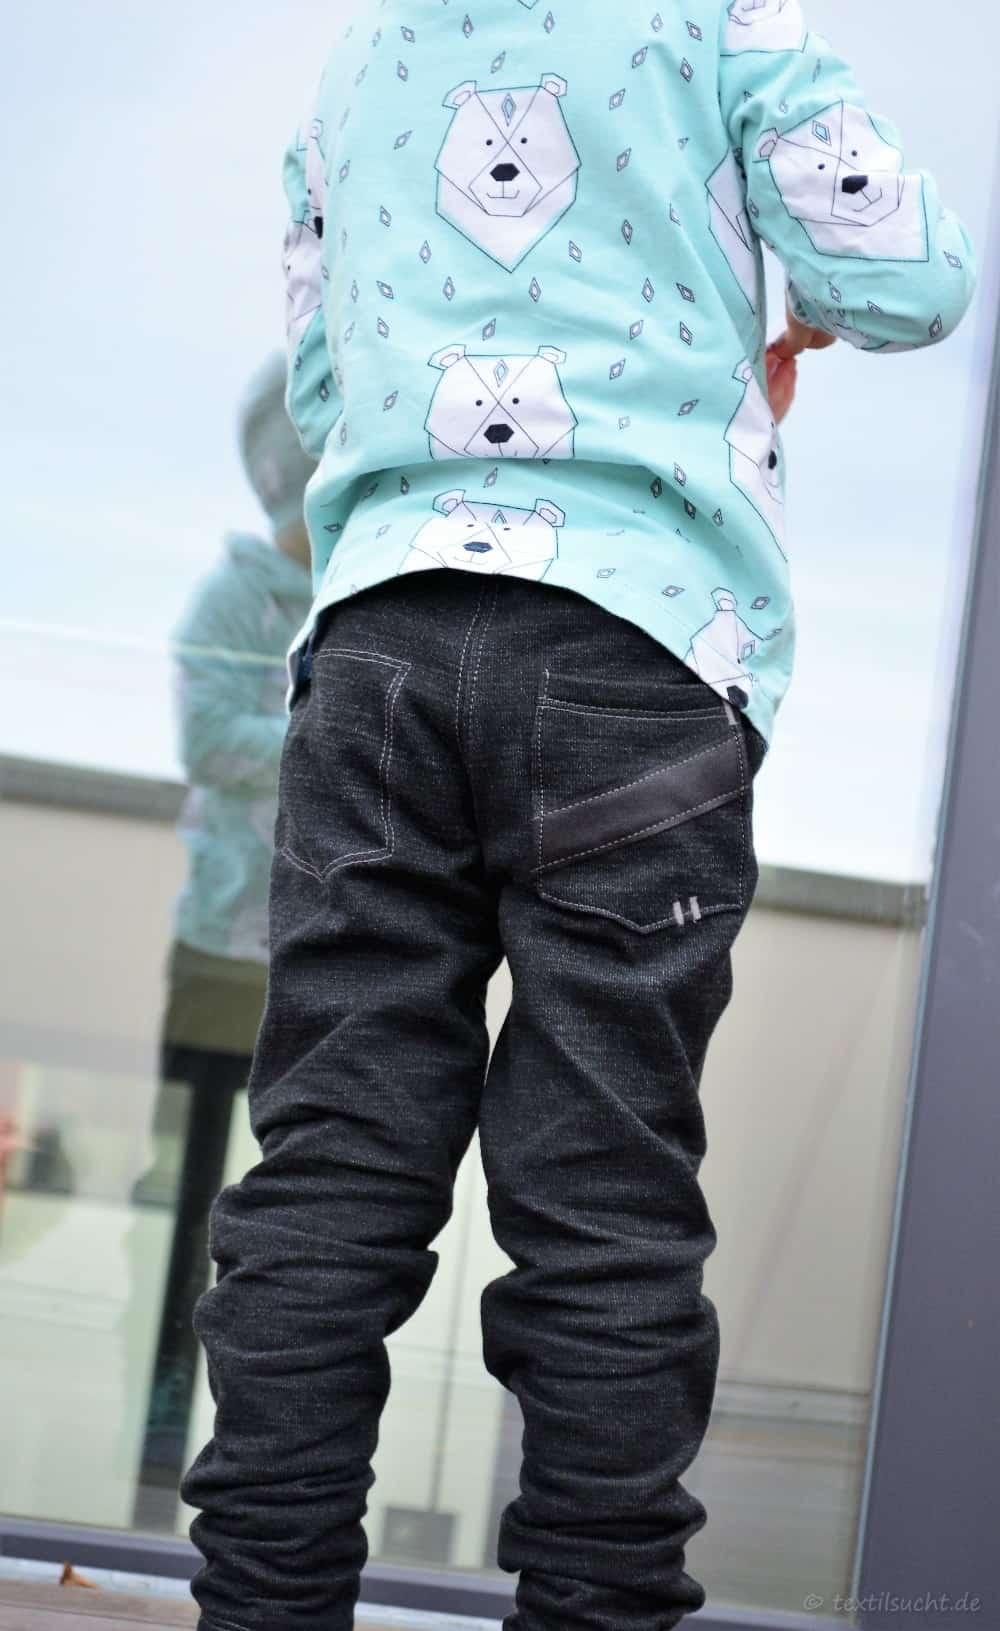 Schnittmuster Kinderhose Steppo aus Wollsweat - Bild 12 | textilsucht.de